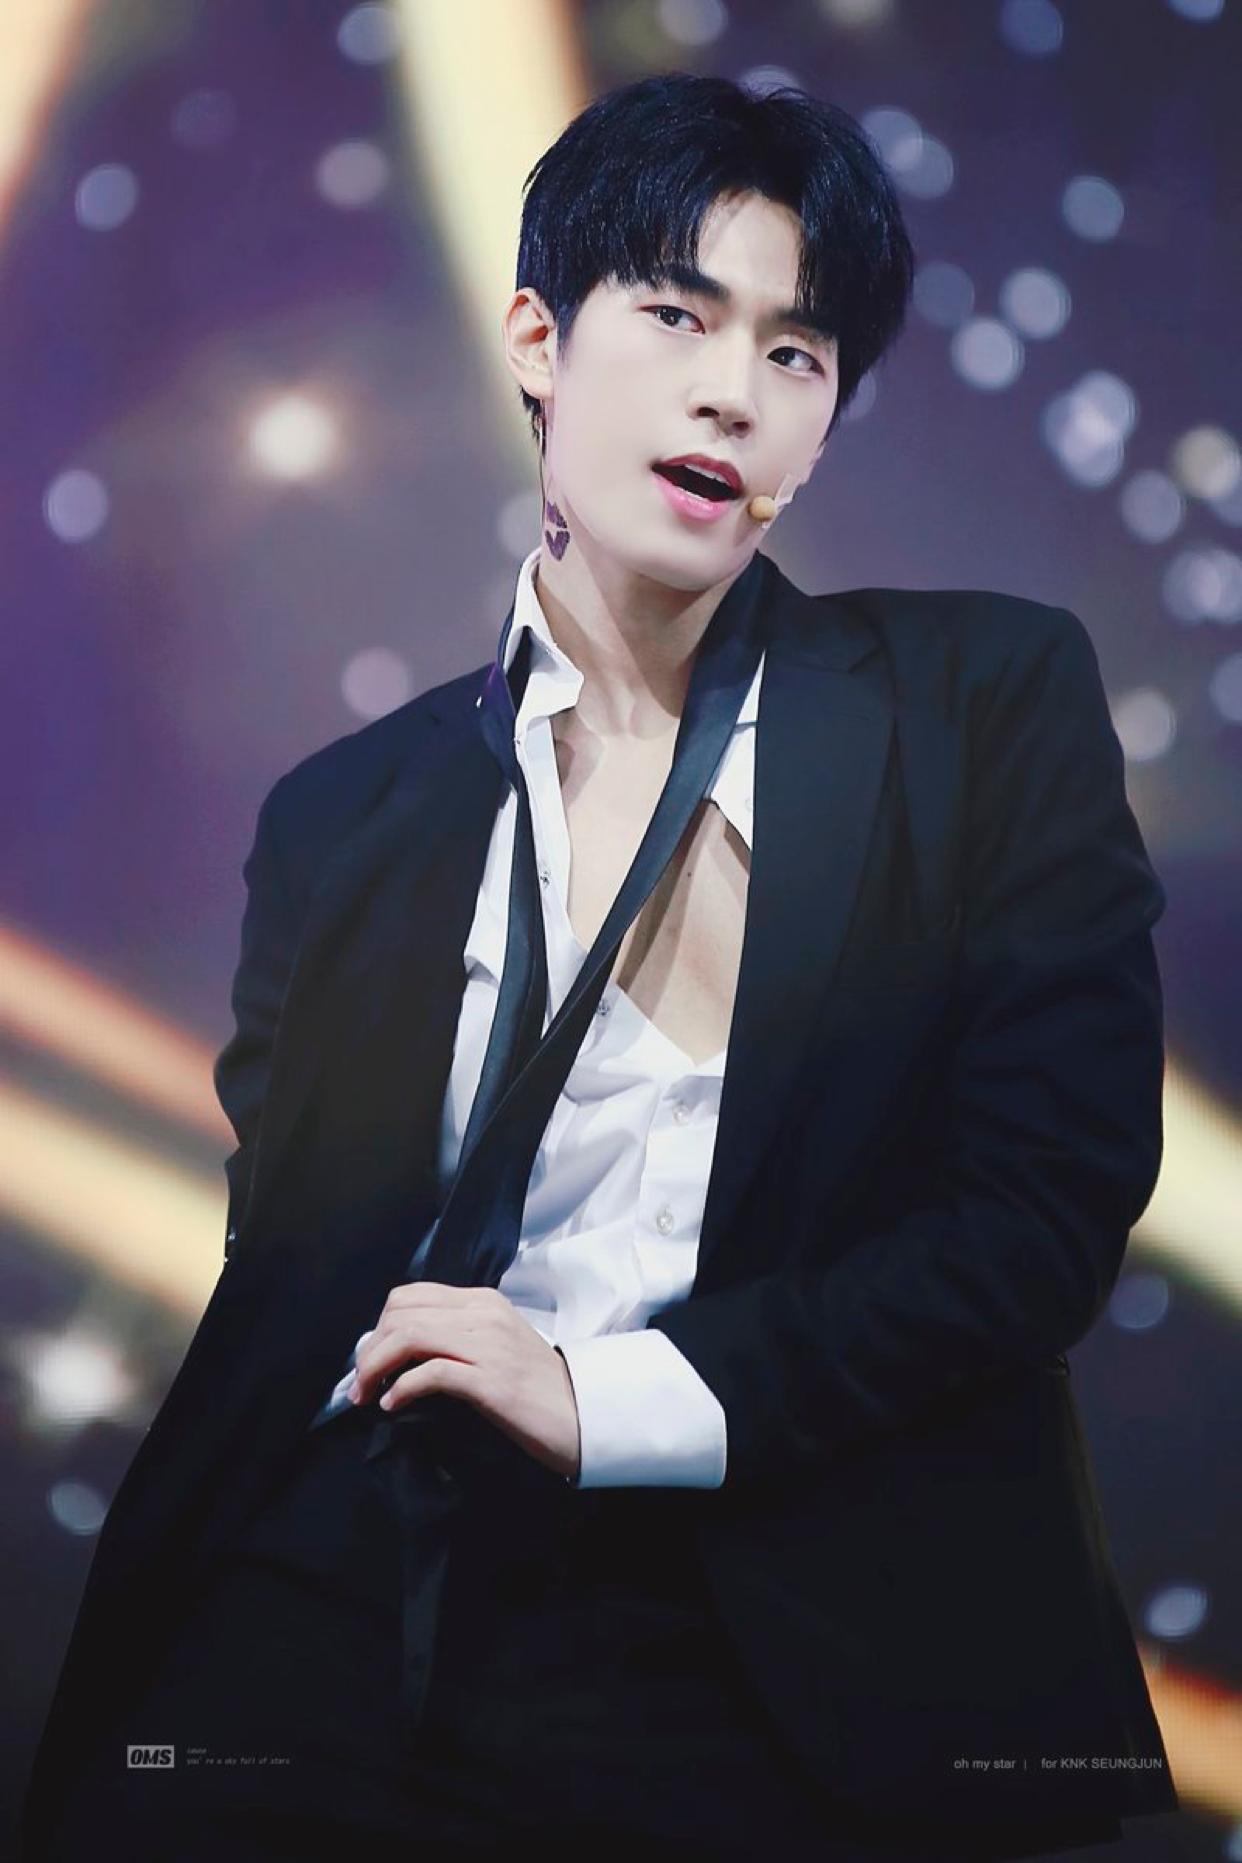 ParkSeungJun #park #Seungjun #KNK #kpop #rapper #visual #mix9 #mixnine #박승준  #승준 #승준짱짱 #크나큰 #팝스타 | Cute korean boys, Knk kpop, Knk seungjun